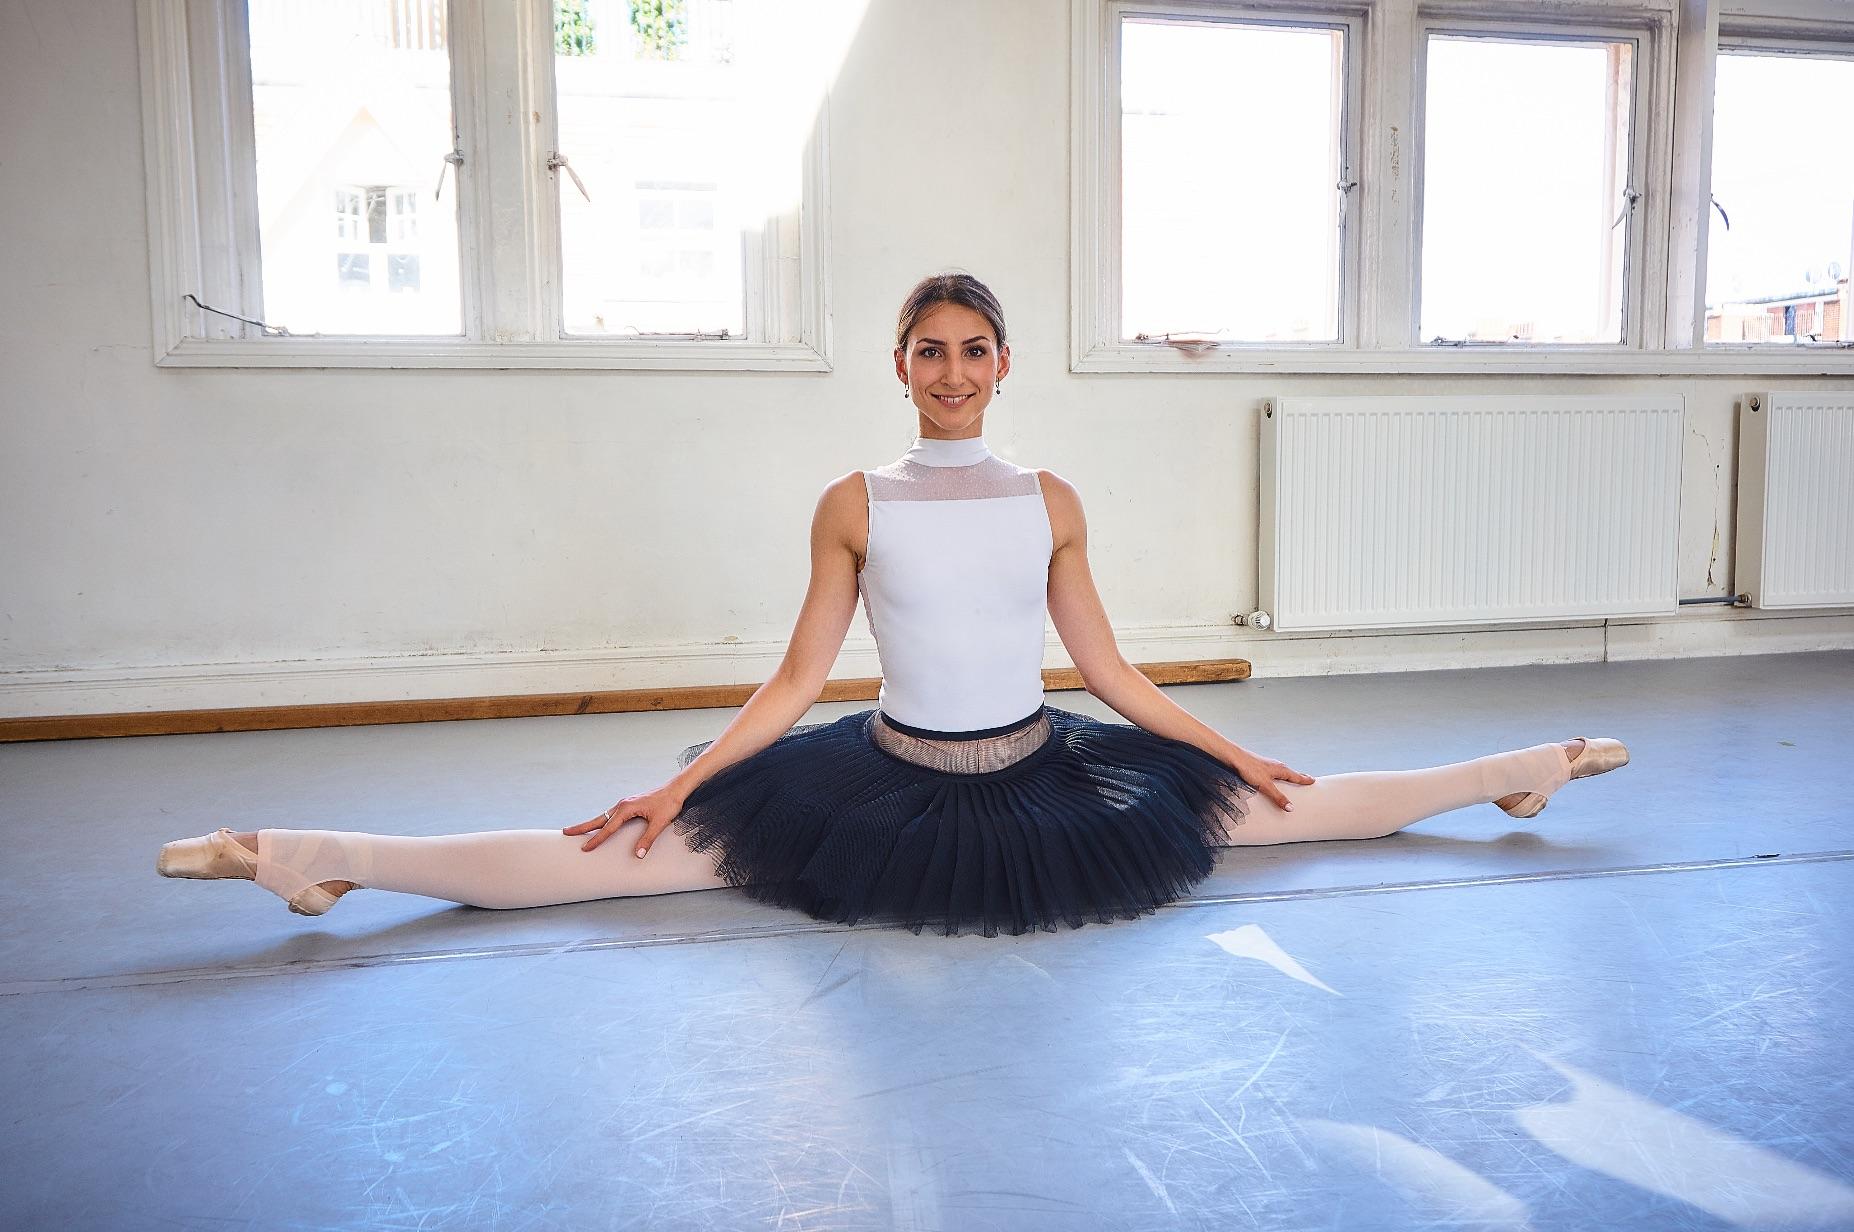 8 week Absolute beginner ballet course at Danceworks